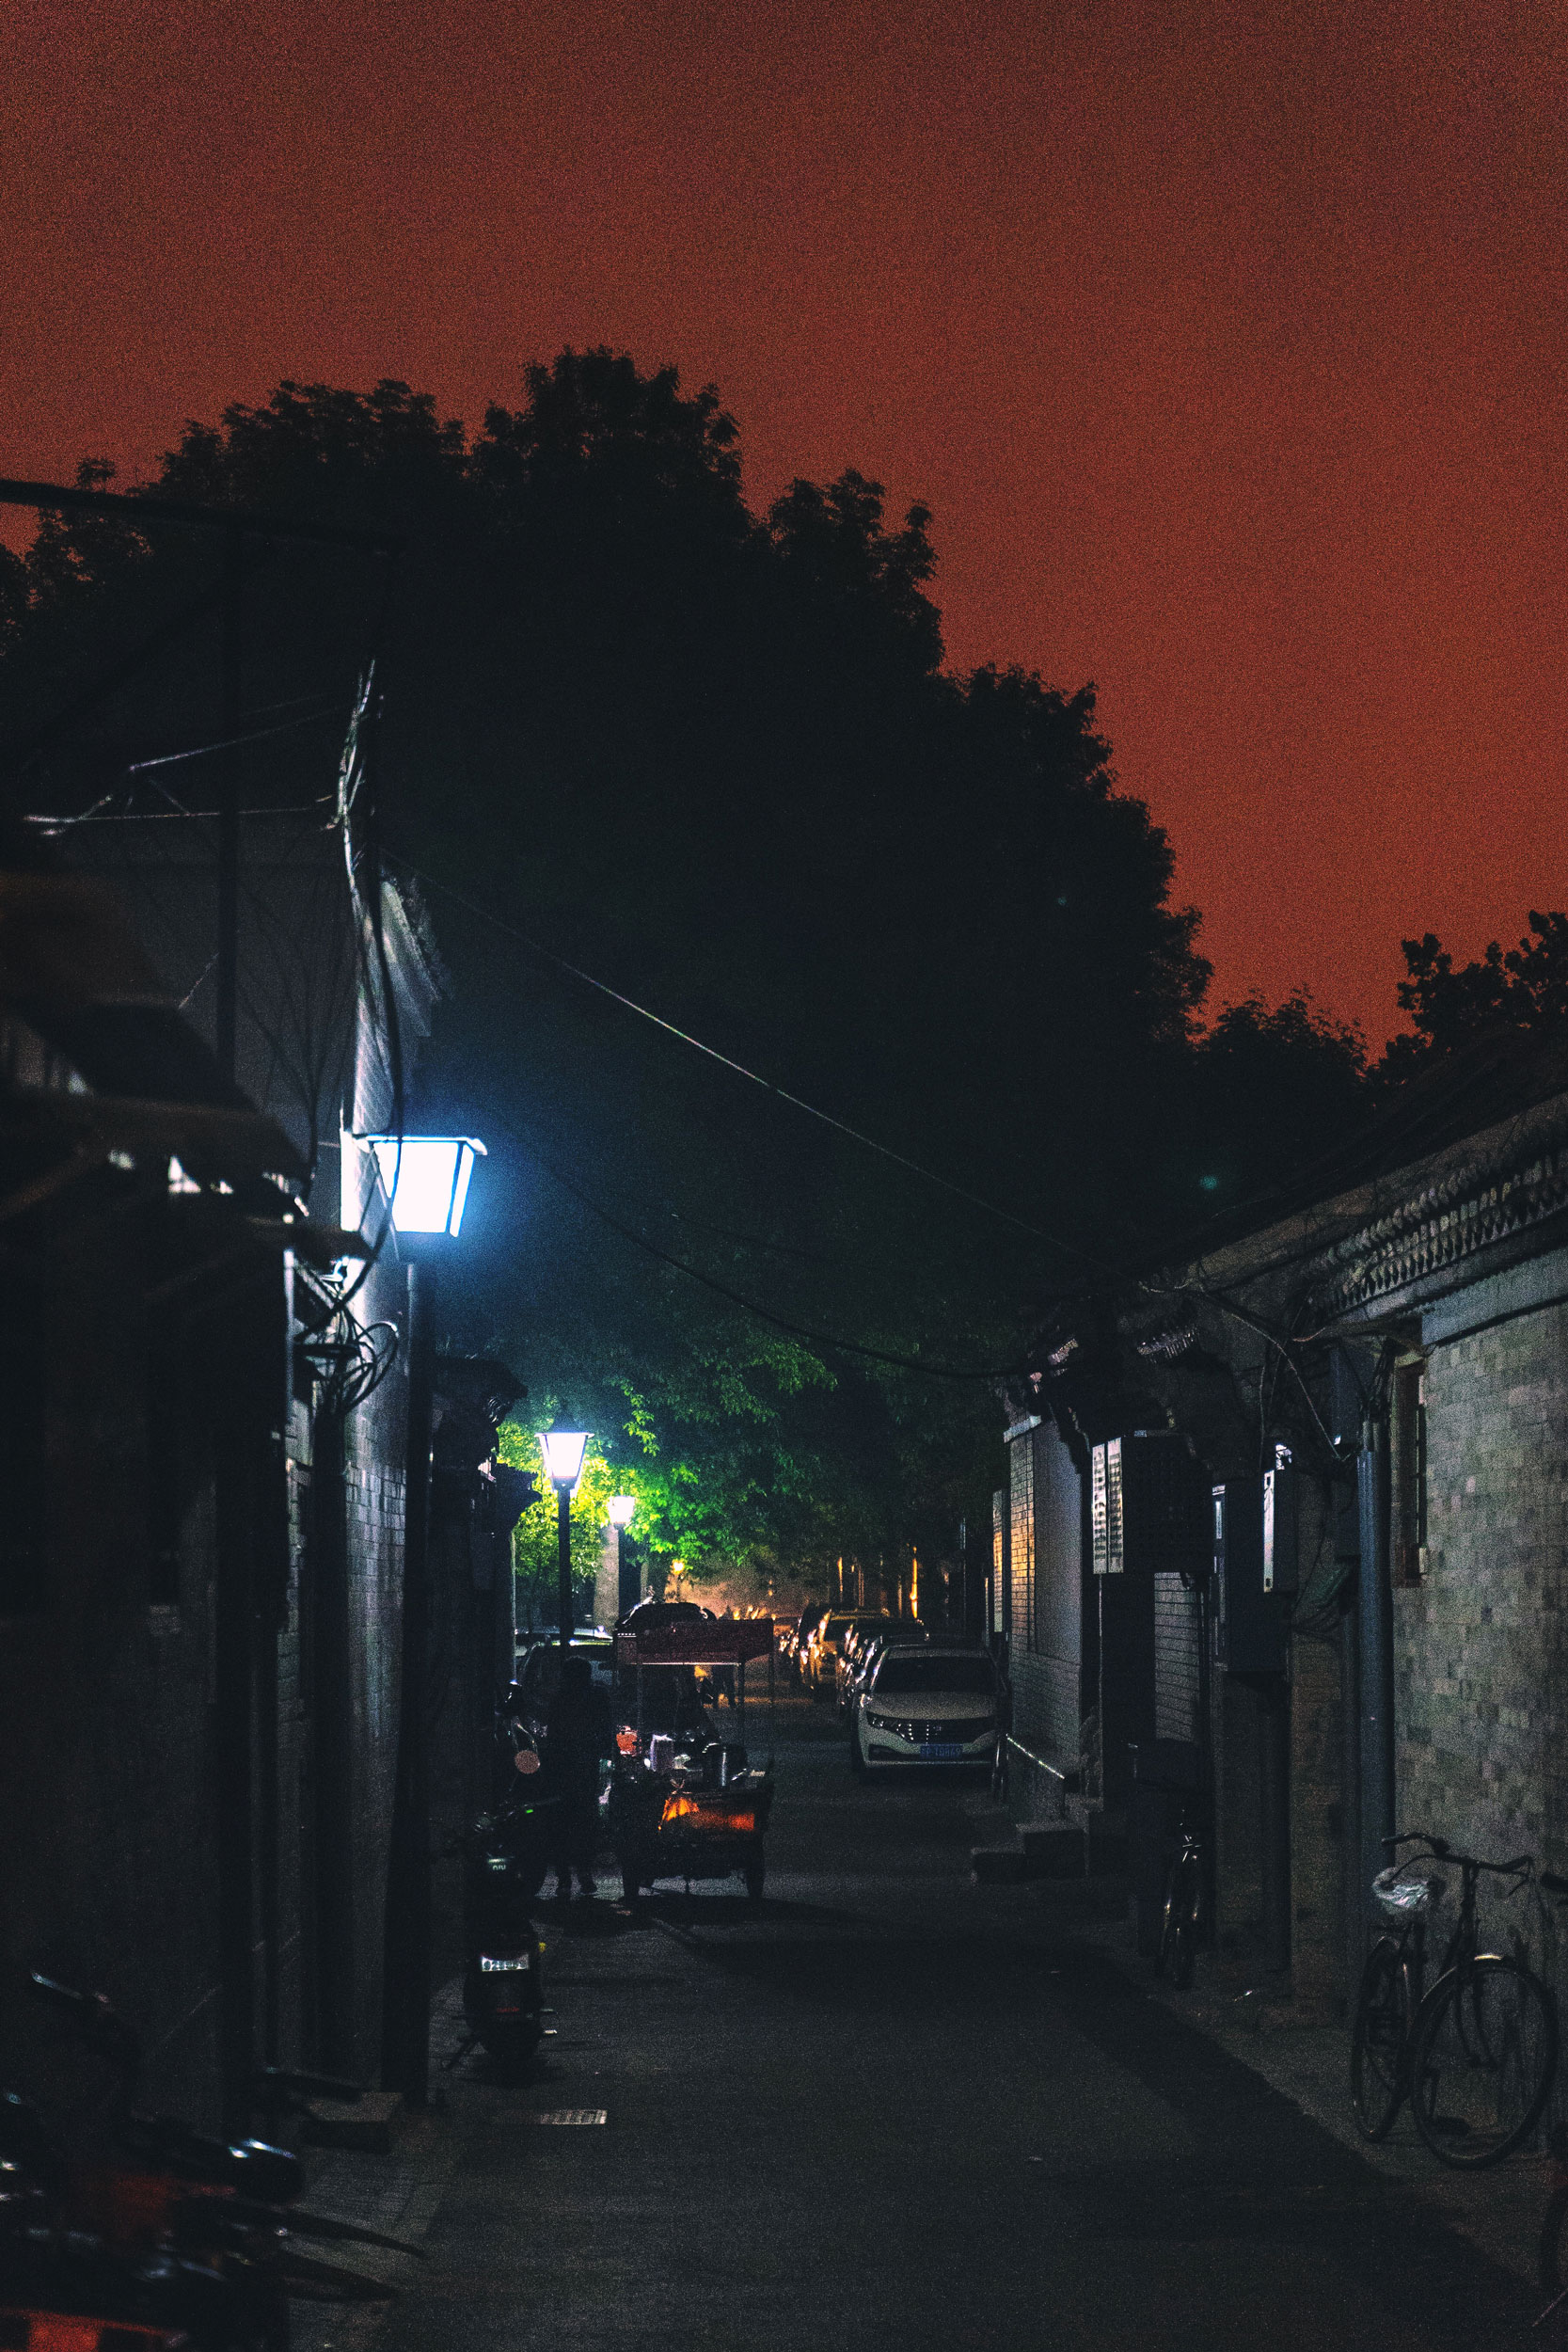 A woman with an open-fire food cart near Luogu Lane under an orange night sky.